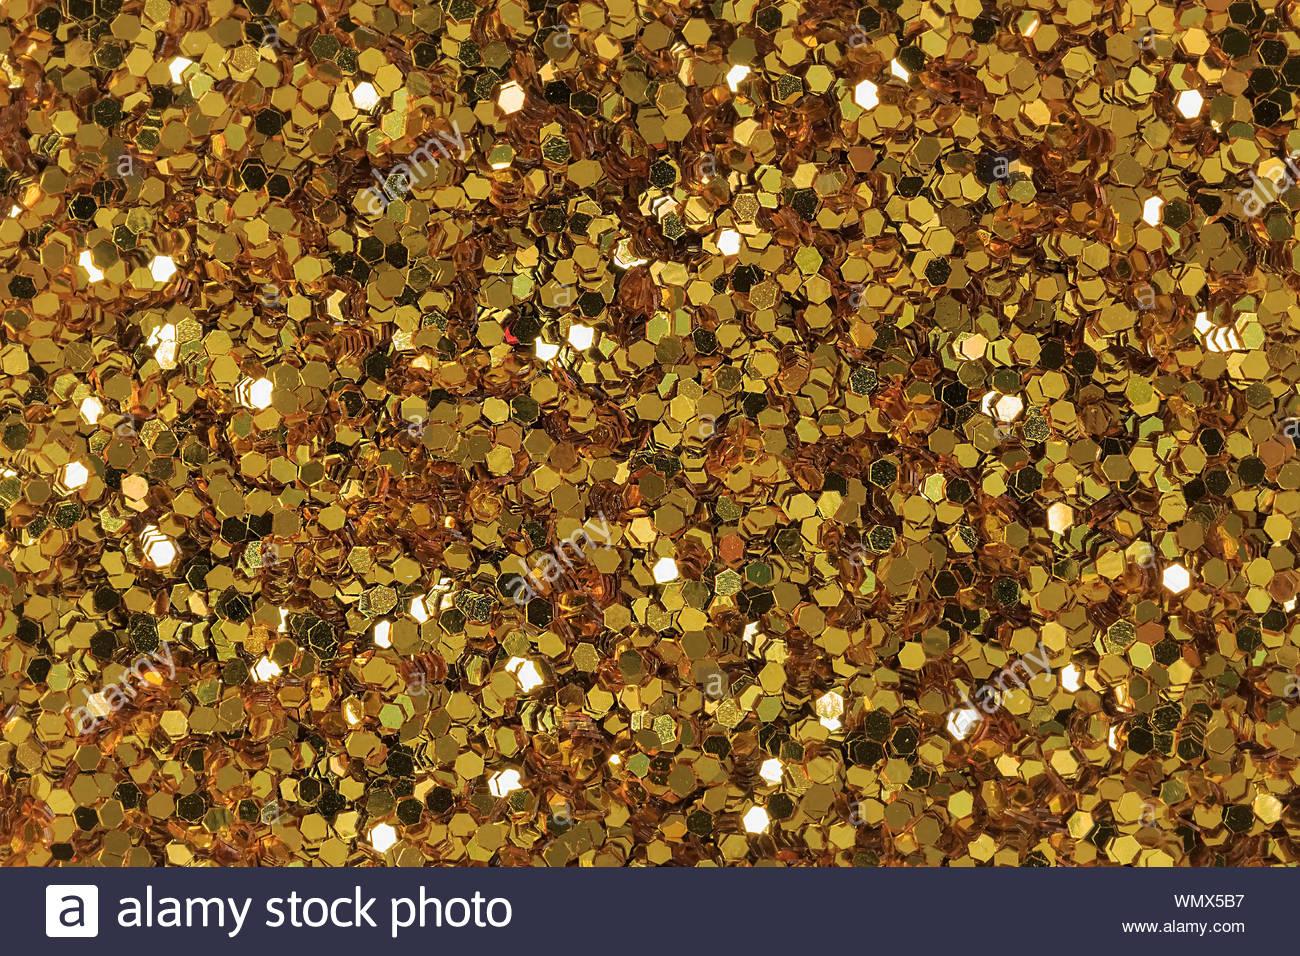 Sparkly glitter background (photograph) Stock Photo